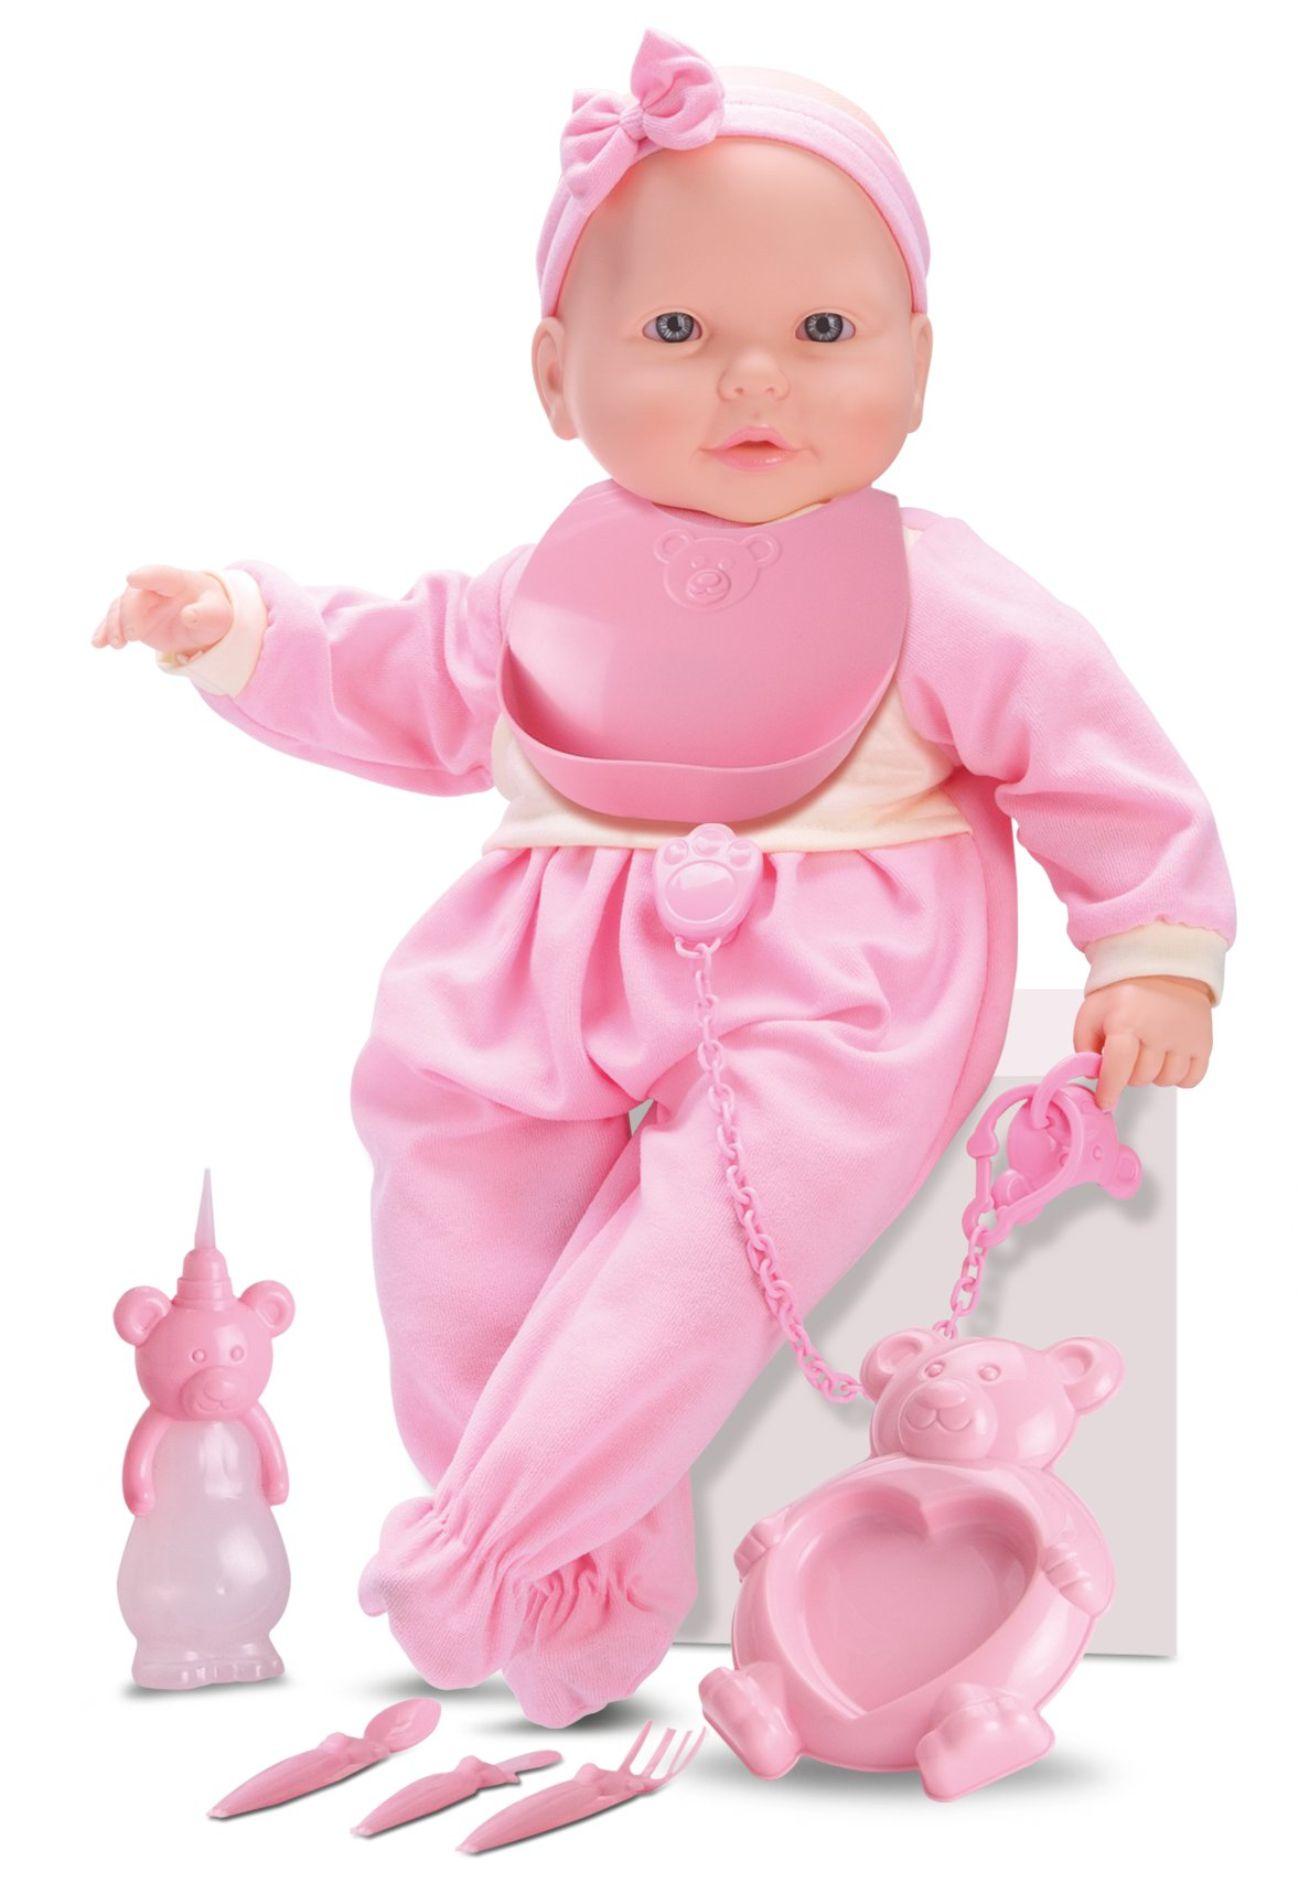 Boneca New Bebê Mania - Baba - Roma Brinquedos